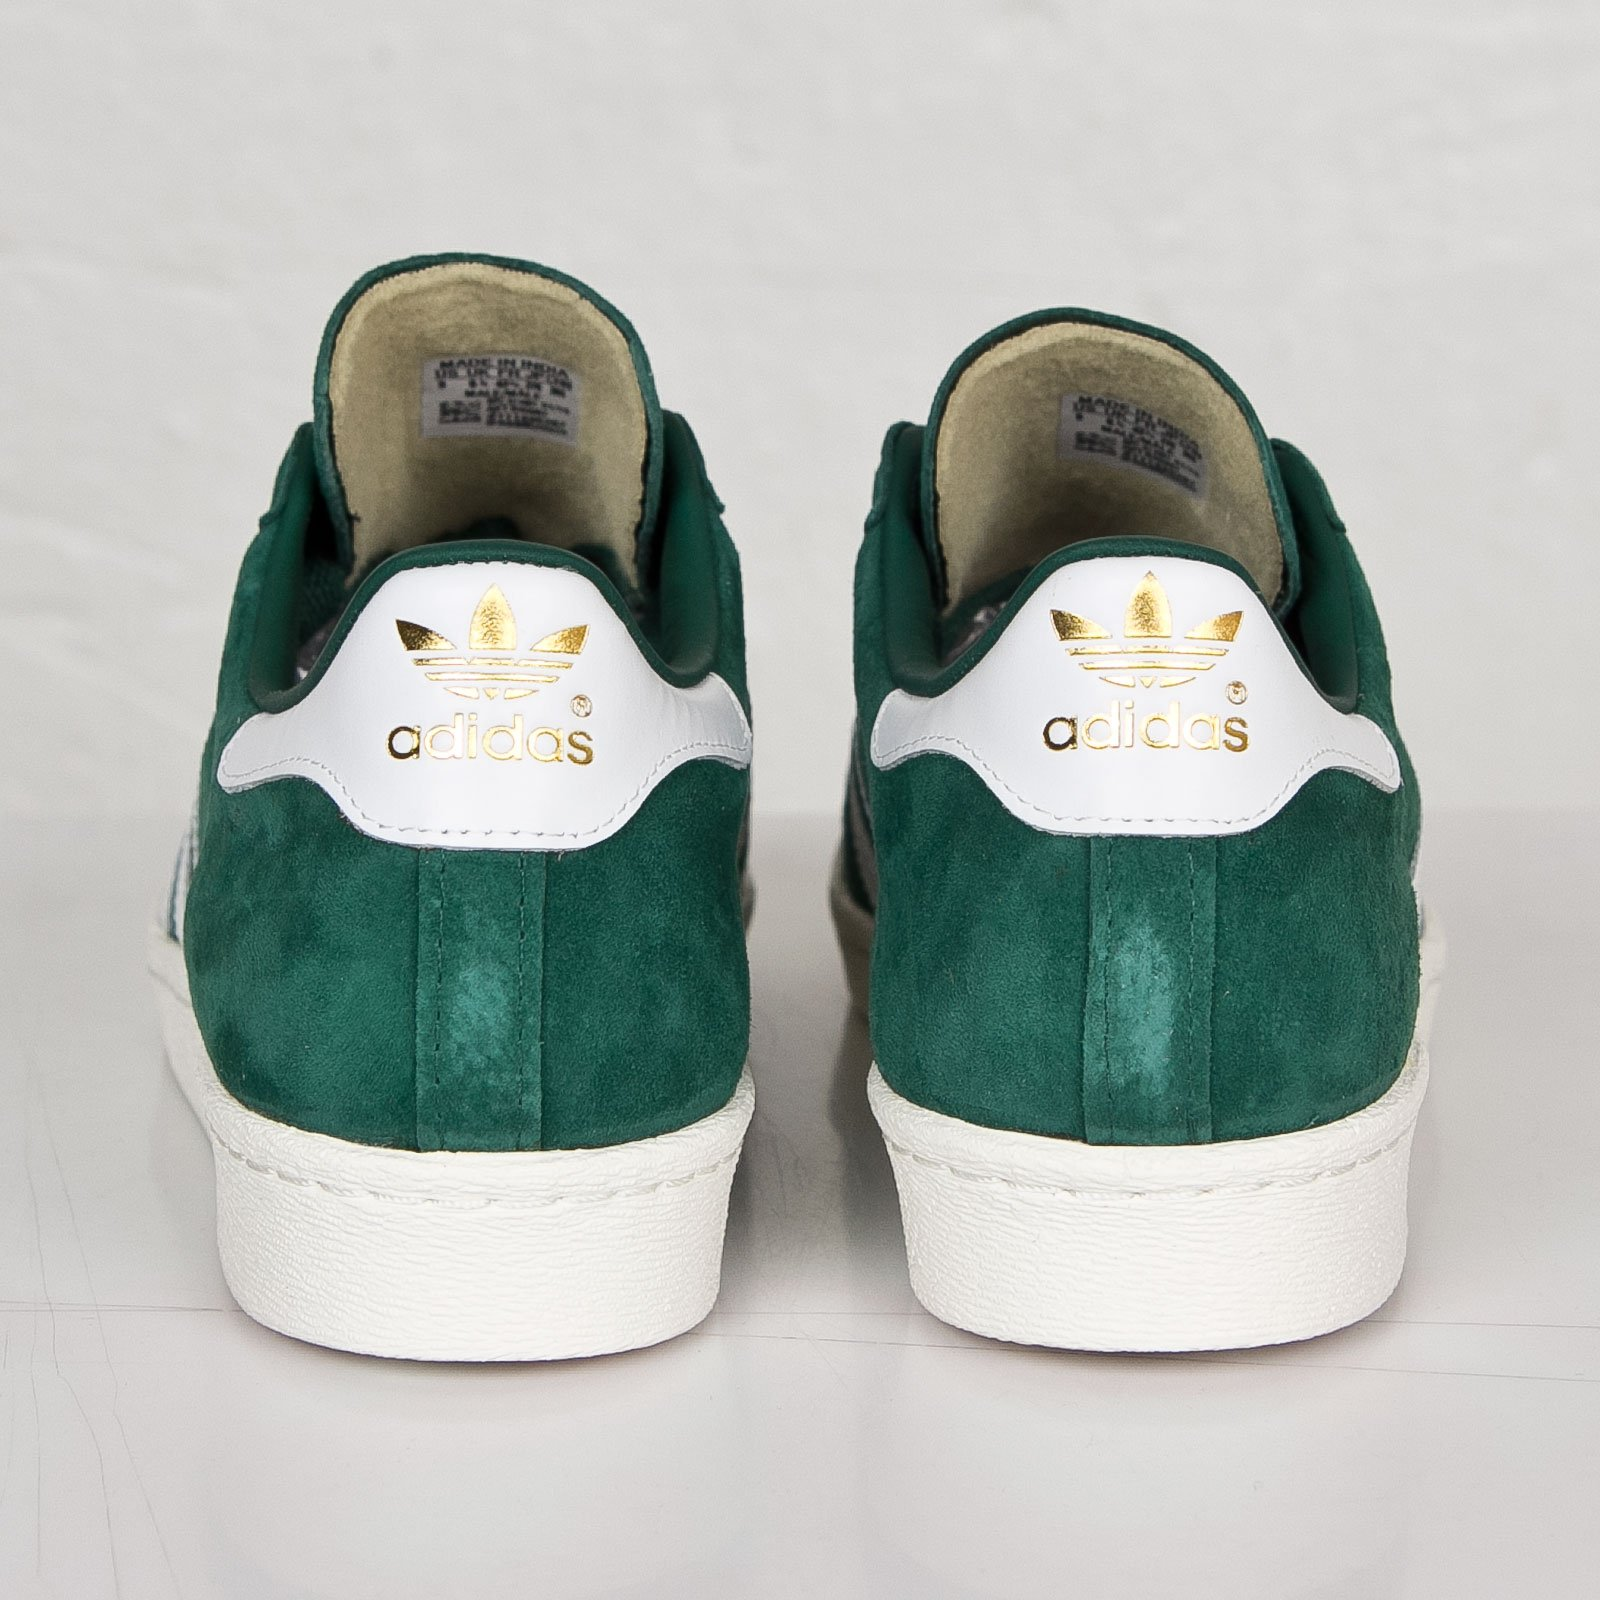 8fb2e600bb49 adidas Superstar 80s Deluxe Suede - B35987 - Sneakersnstuff ...